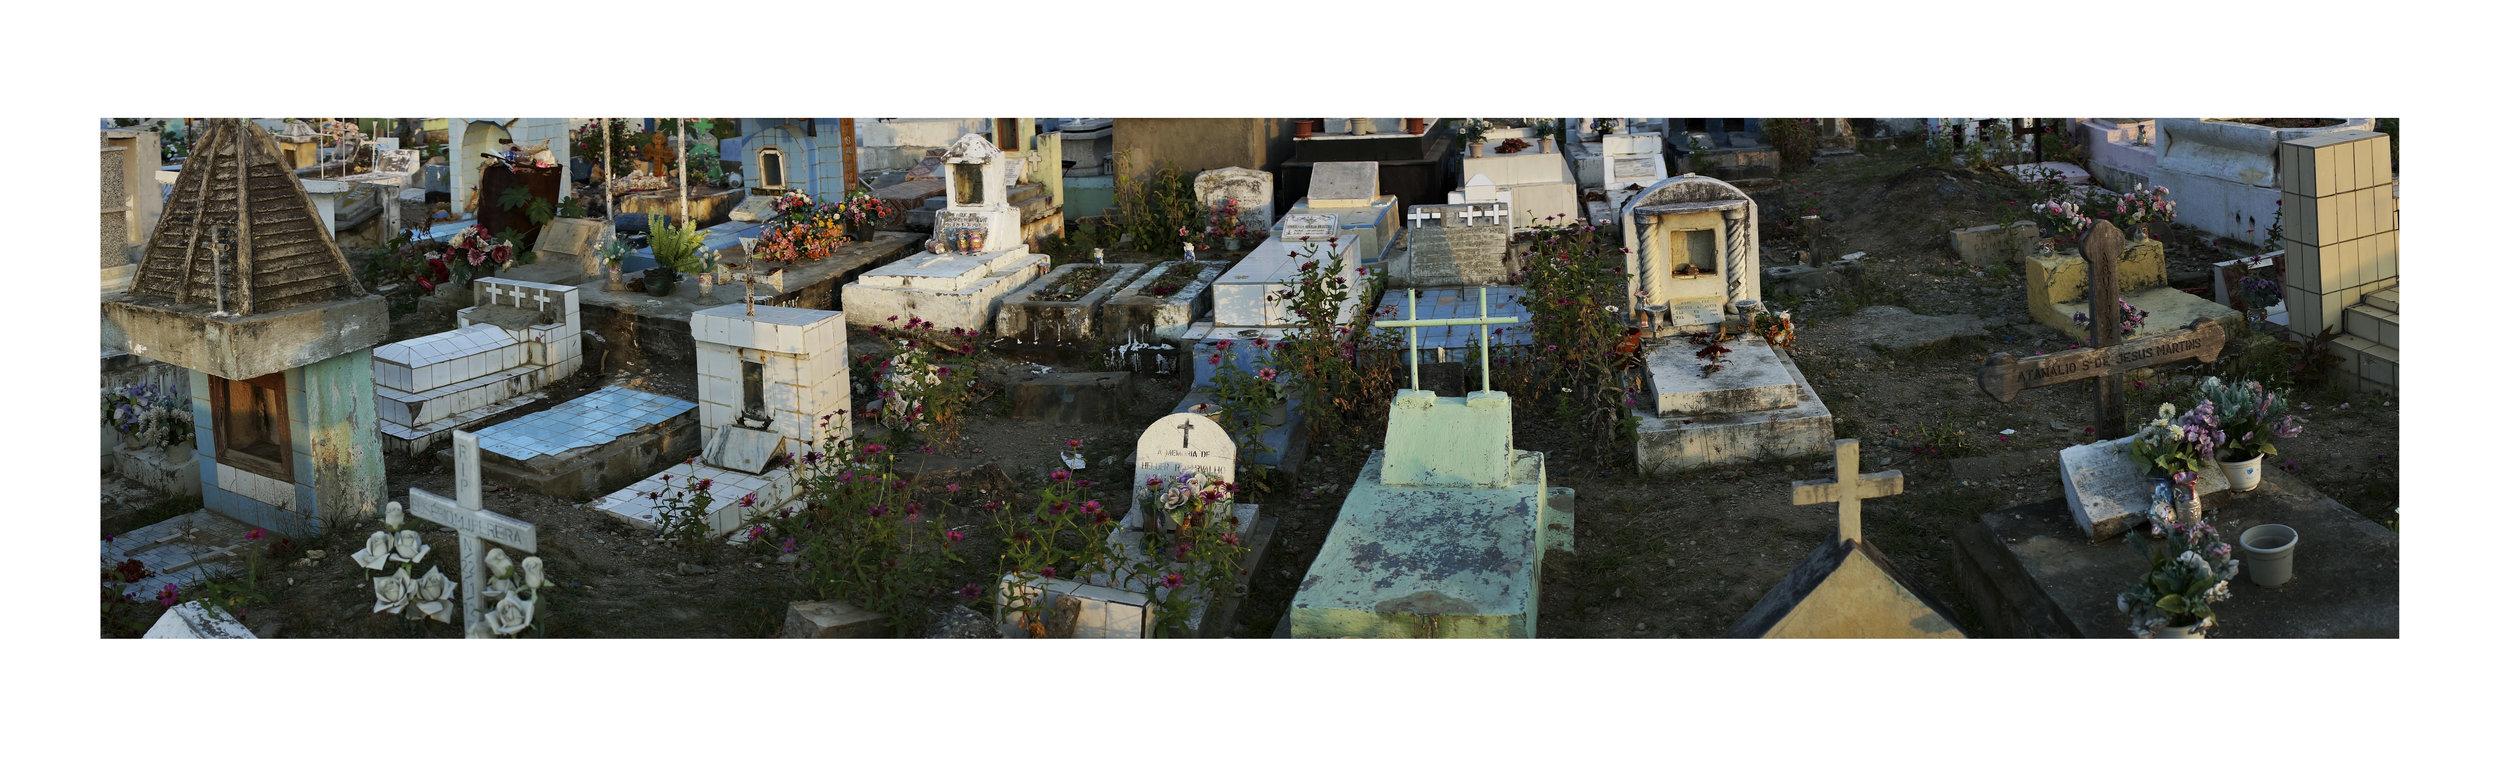 LYNDELL BROWN AND CHARLES GREEN   Santa Cruz, Dusk 2  2018 Digital Photograph on Rag Paper, Framed 87 x 290 cm